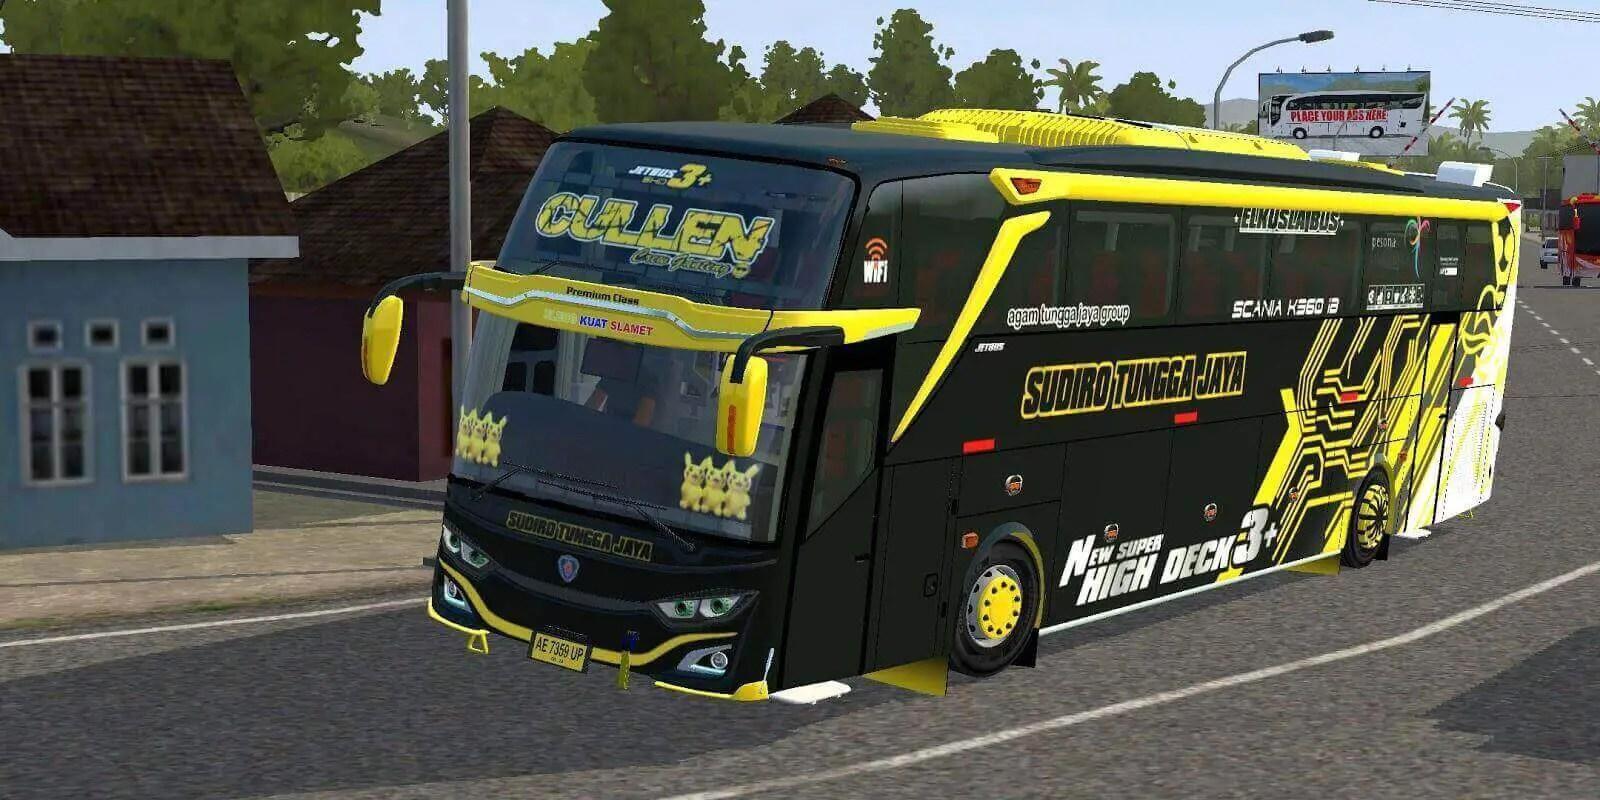 JetBus3+ SHD Scania K360 Mod BUSSID, Mod JetBus3+ SHD Scania K360 BUSSID, BUSSID Bus Mod, Scania Bus Mod BUSSID, BUSSID Mod